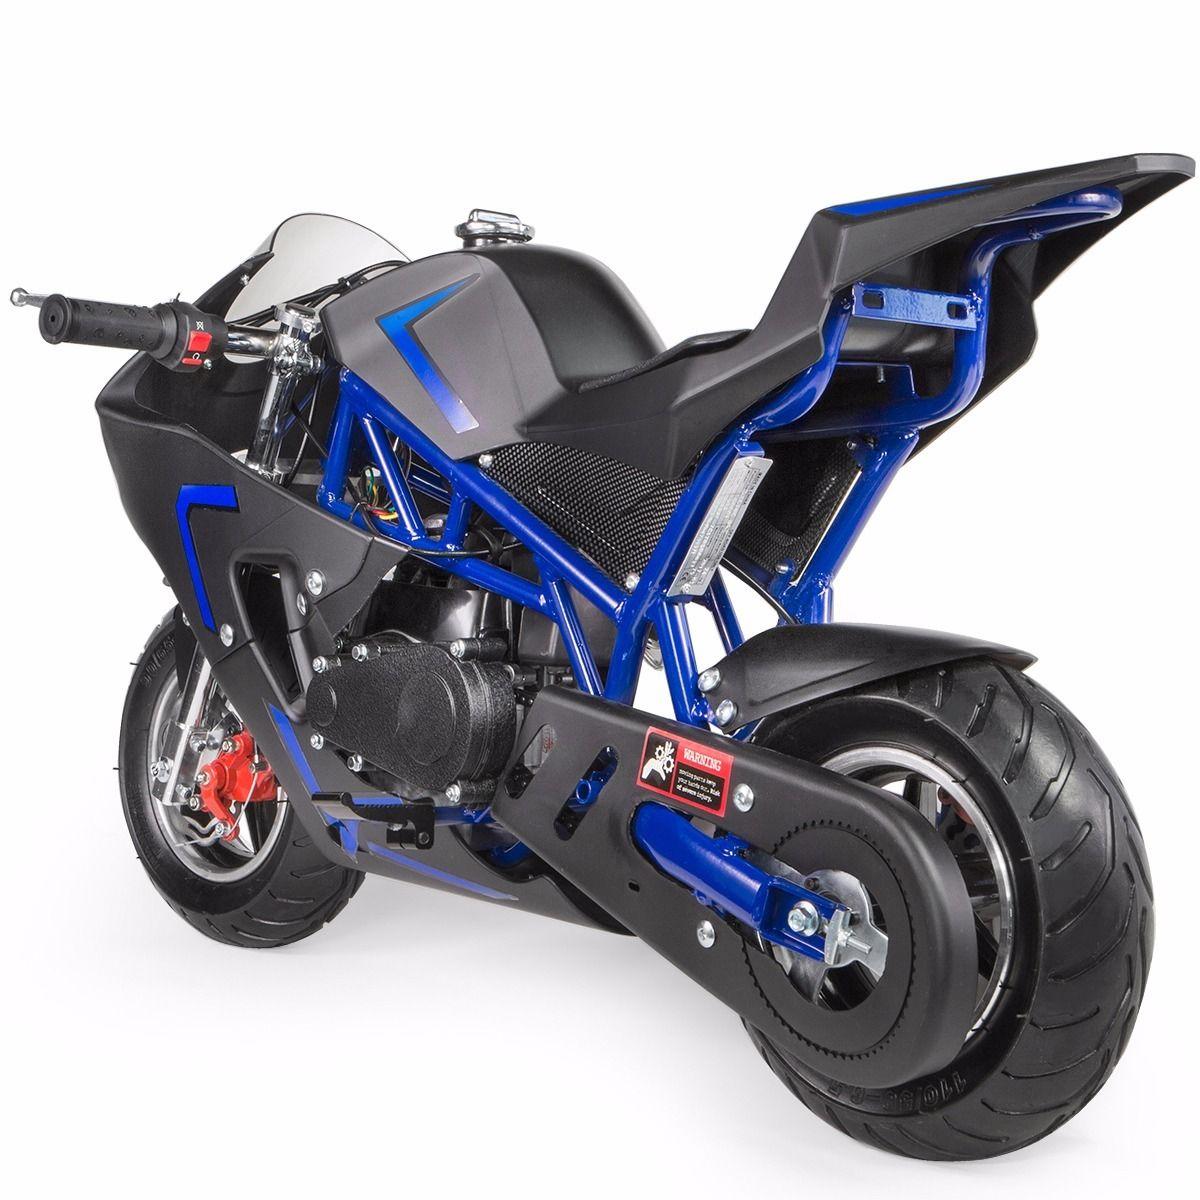 XtremepowerUS-Gas-Pocket-Bike-Motor-Bike-Scooter-40cc-Epa-Engine-Motorcycle thumbnail 6